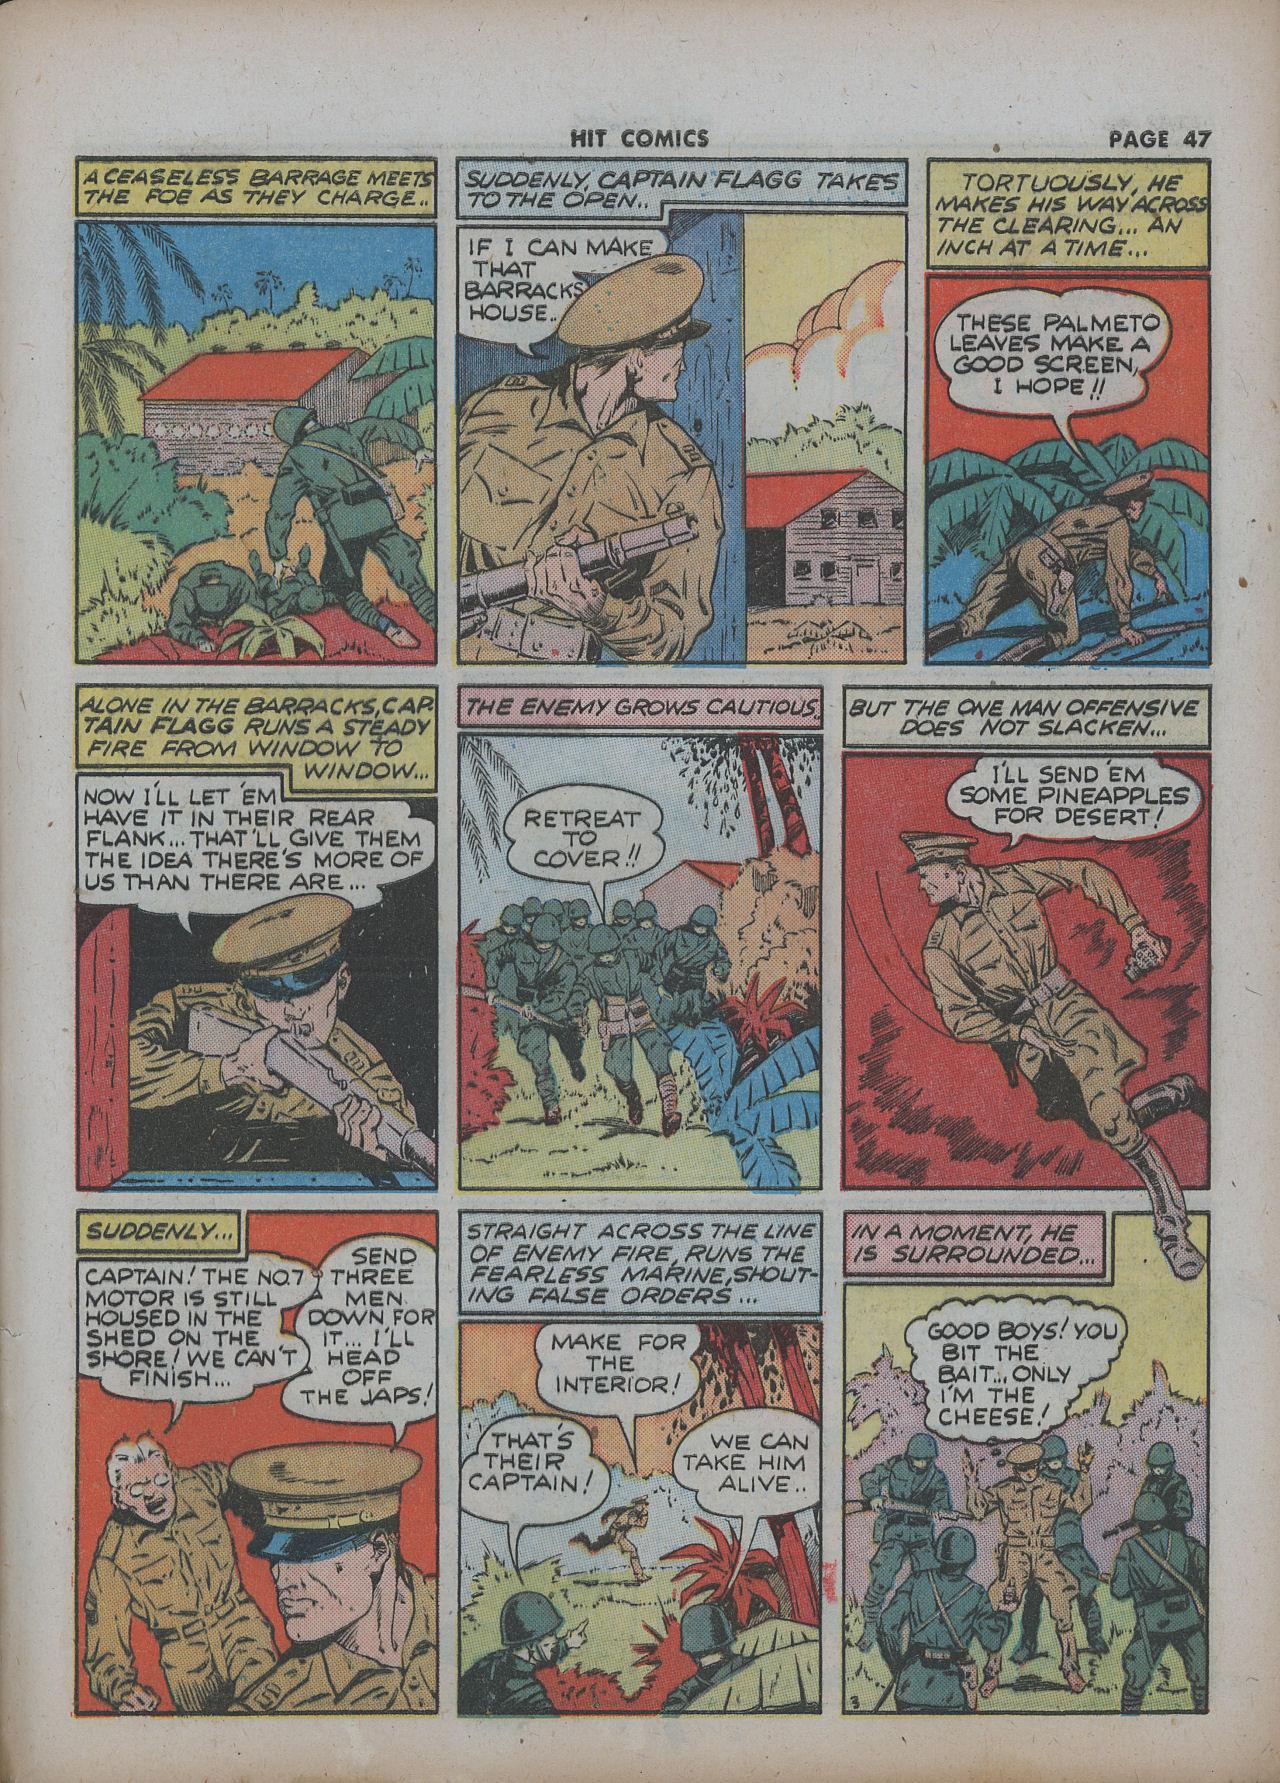 Read online Hit Comics comic -  Issue #22 - 49